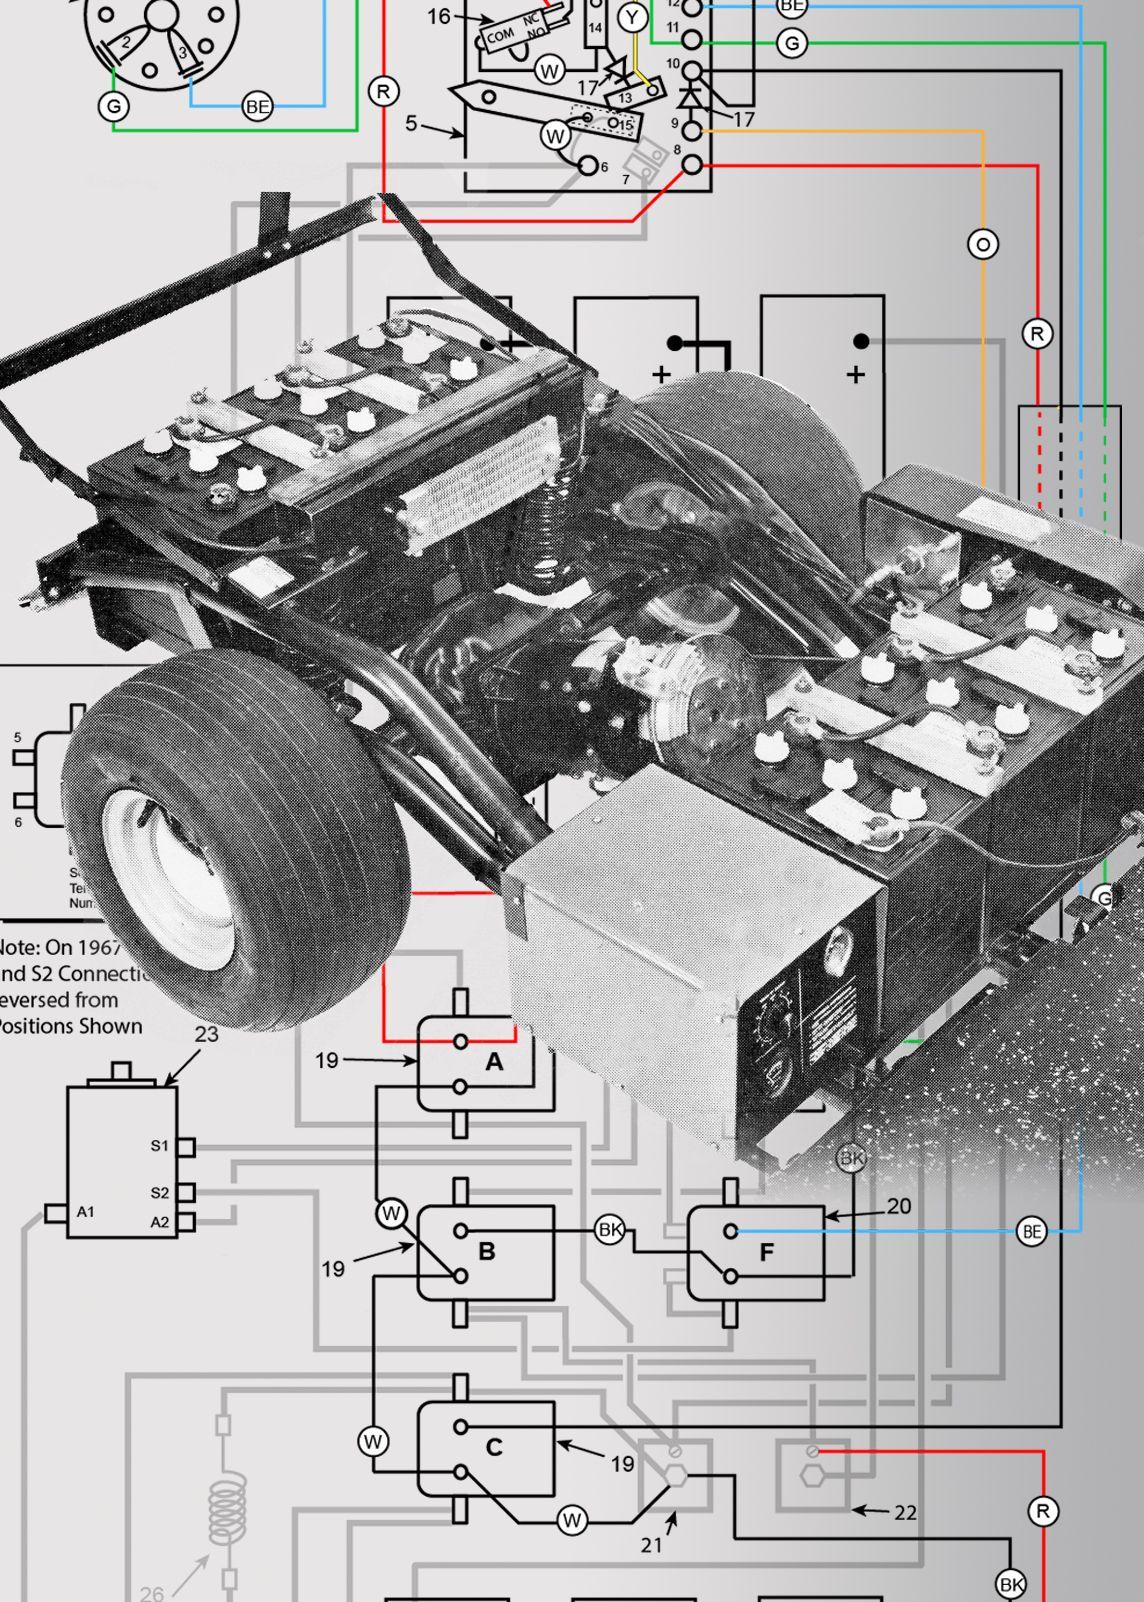 medium resolution of colora coded wiring diagram for 1967 through 1970 harley davidson de model golf carts